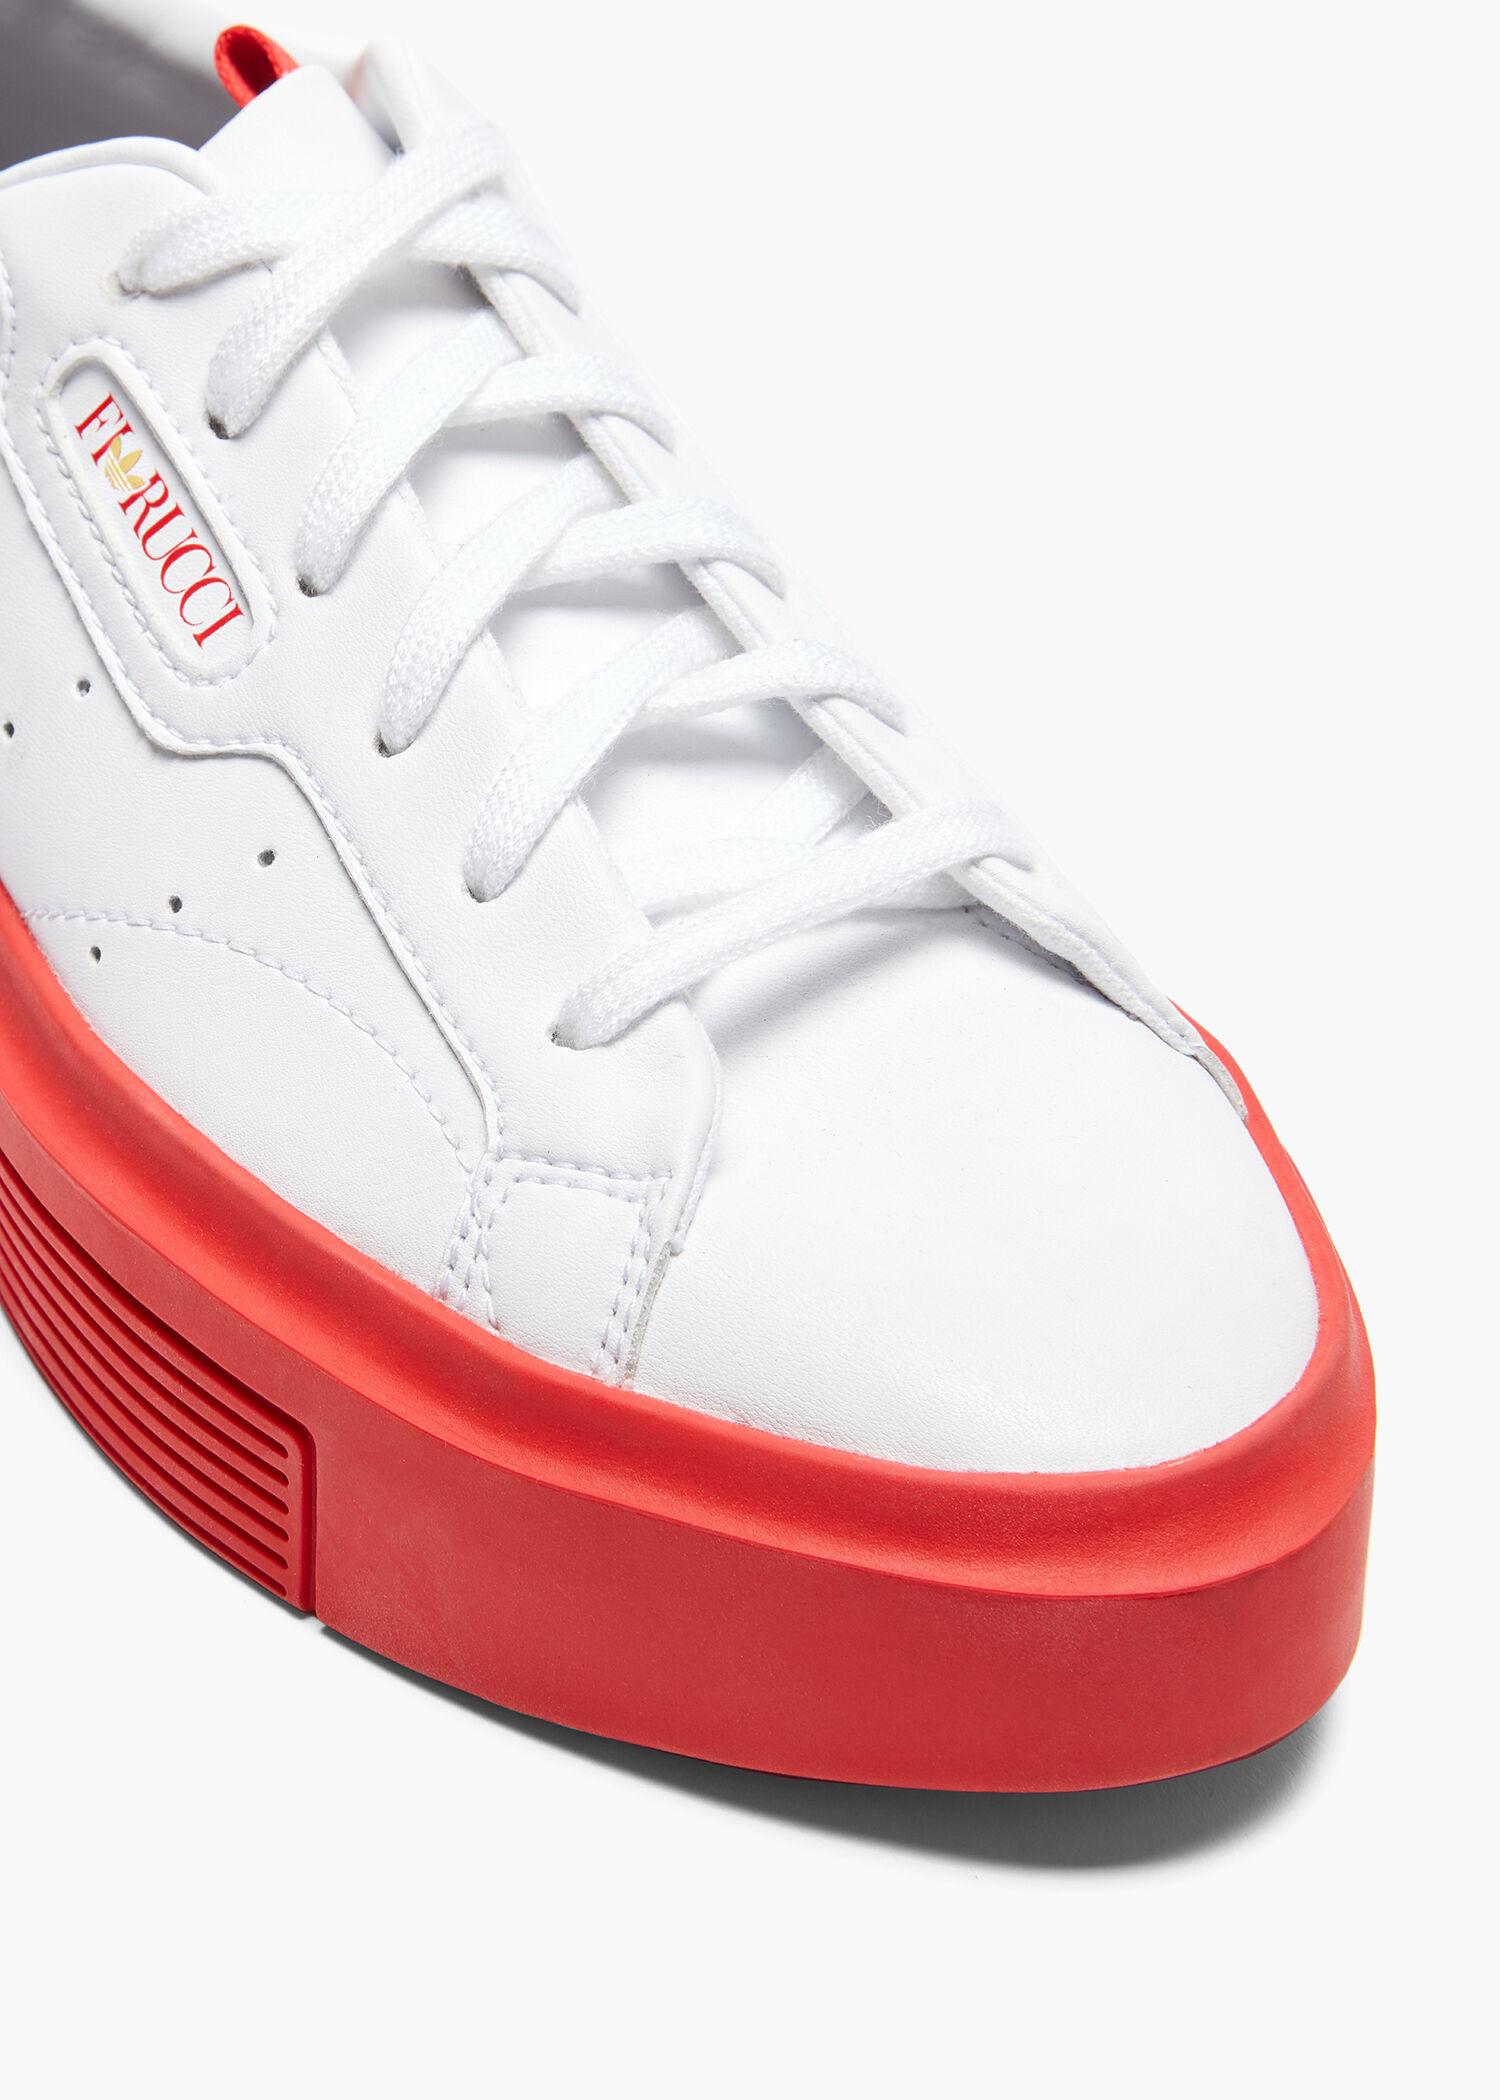 Adidas x Fiorucci Super Sleek Trainers